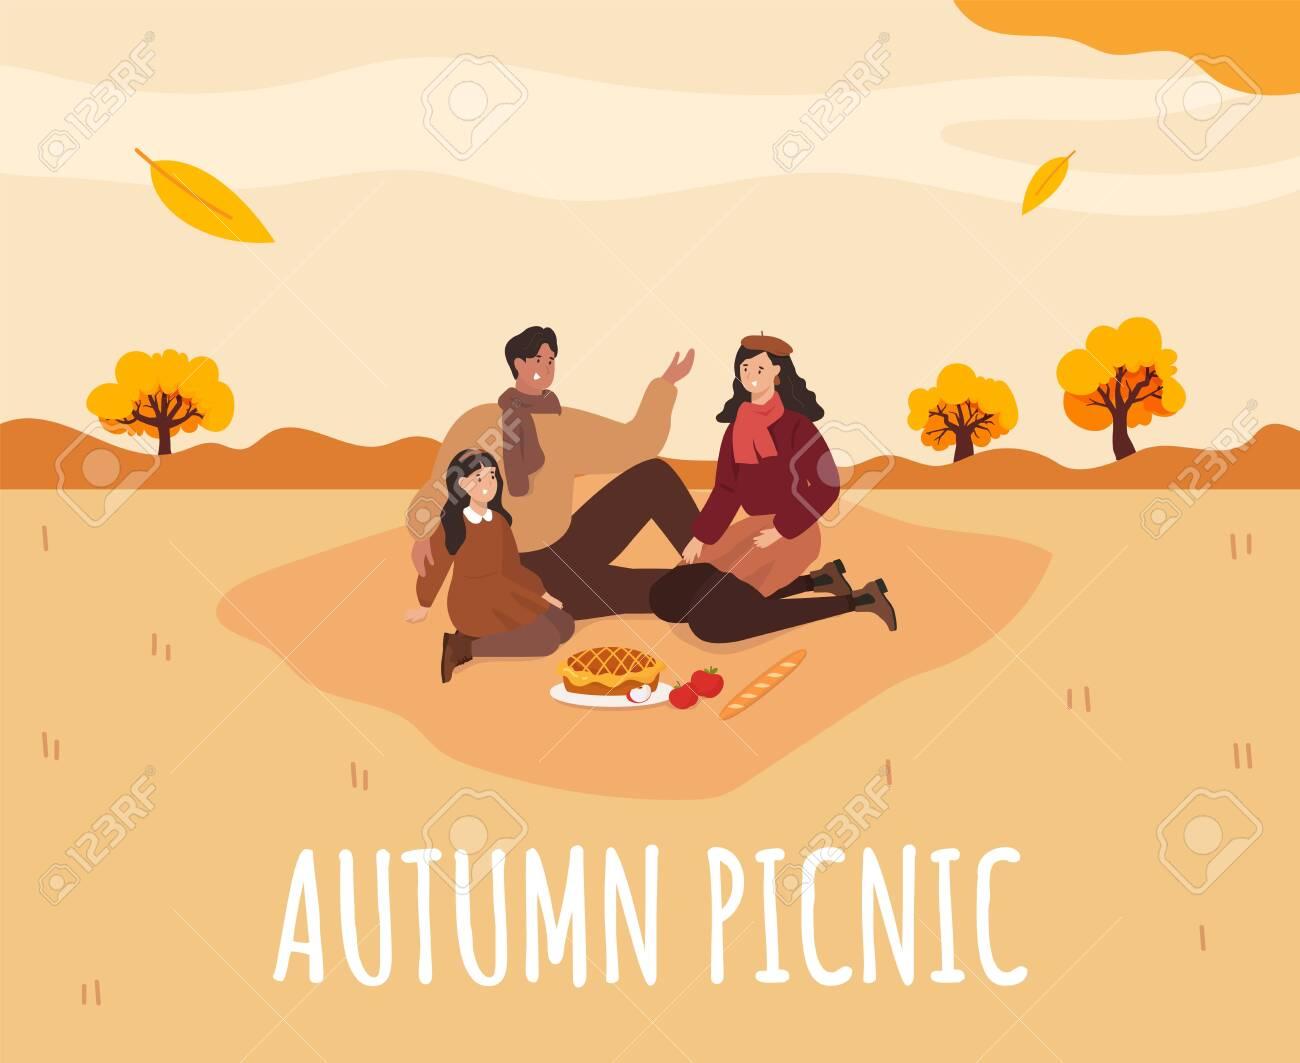 Family picnic in Autumn. Apple pie. Cozy autumn picnic. Vector - 152125895